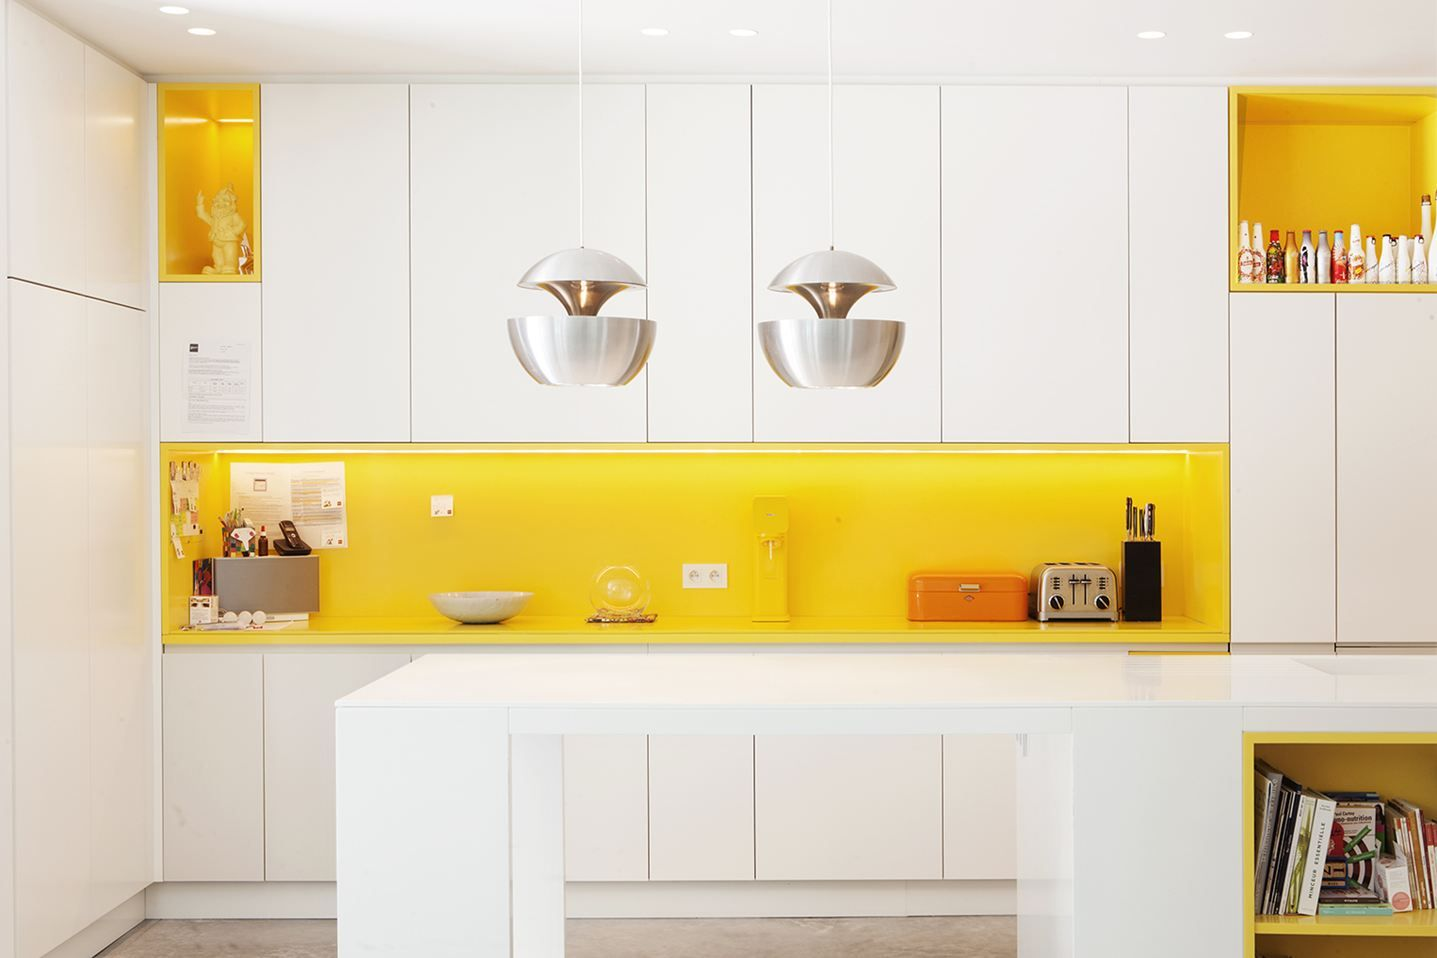 50 Modern Kitchen Designs That Use Unconventional Geometry | Kitchen ...